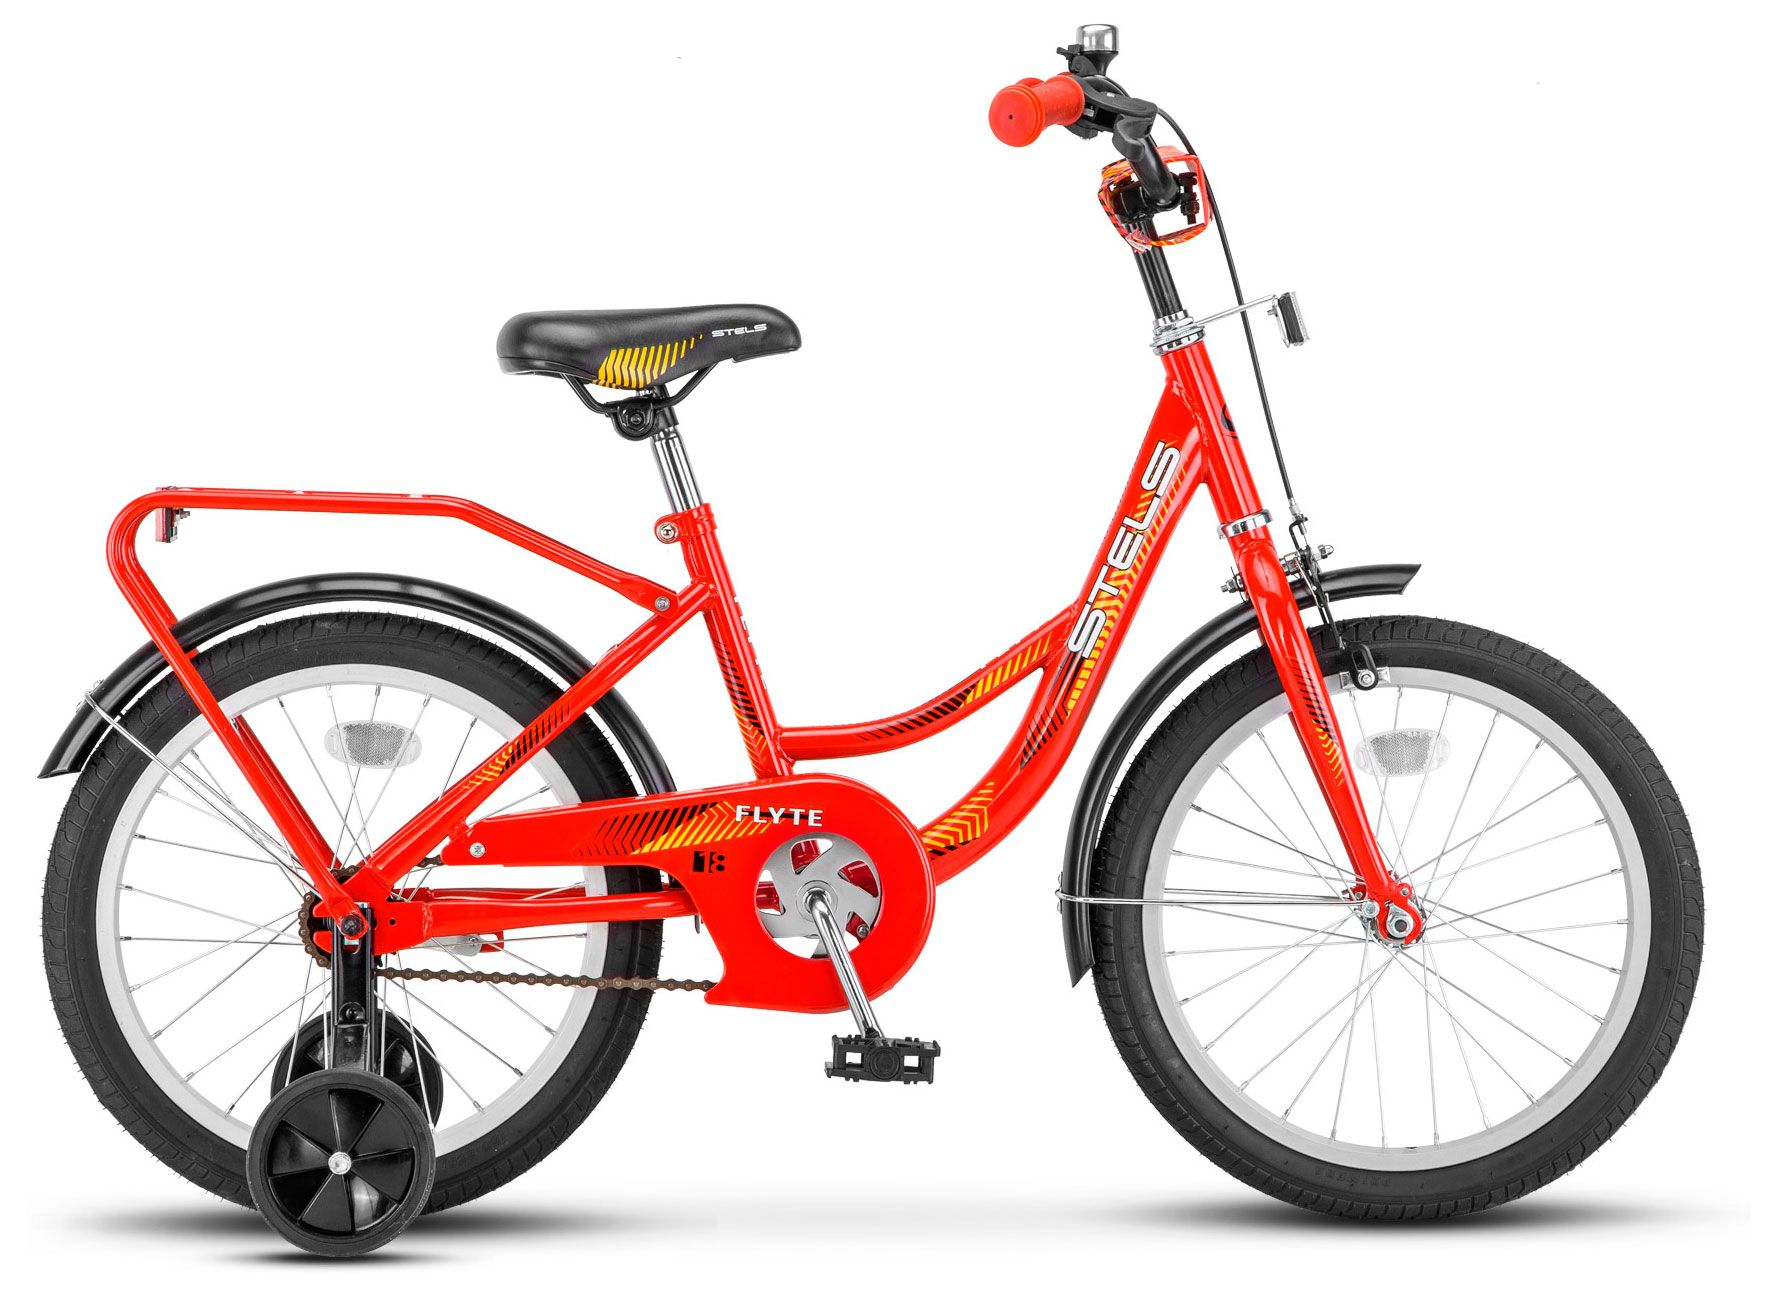 Велосипед Stels Flyte 18 (Z011) 2018